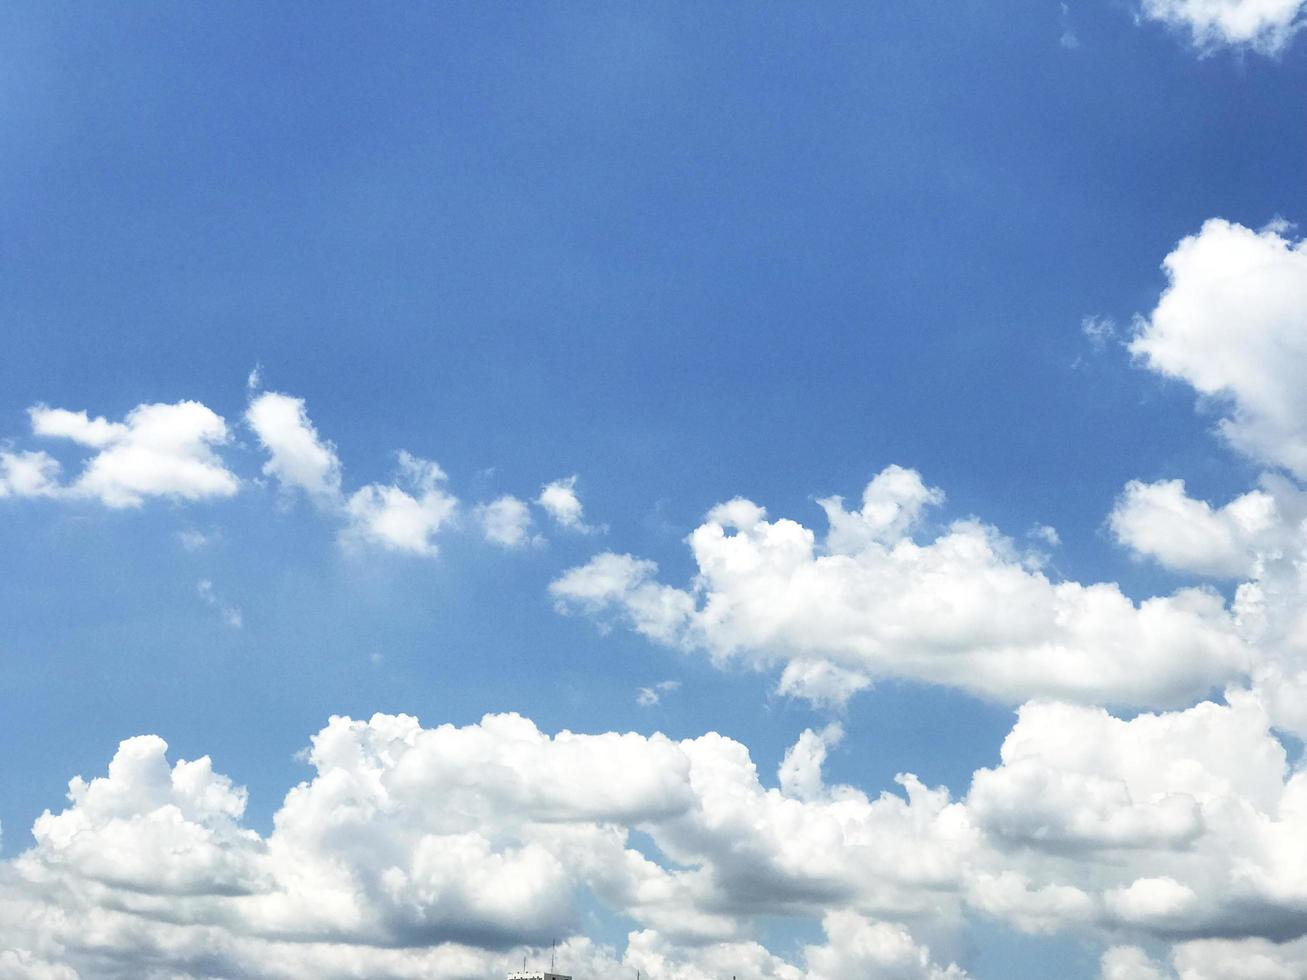 blauwe lucht met pluizige witte wolken foto